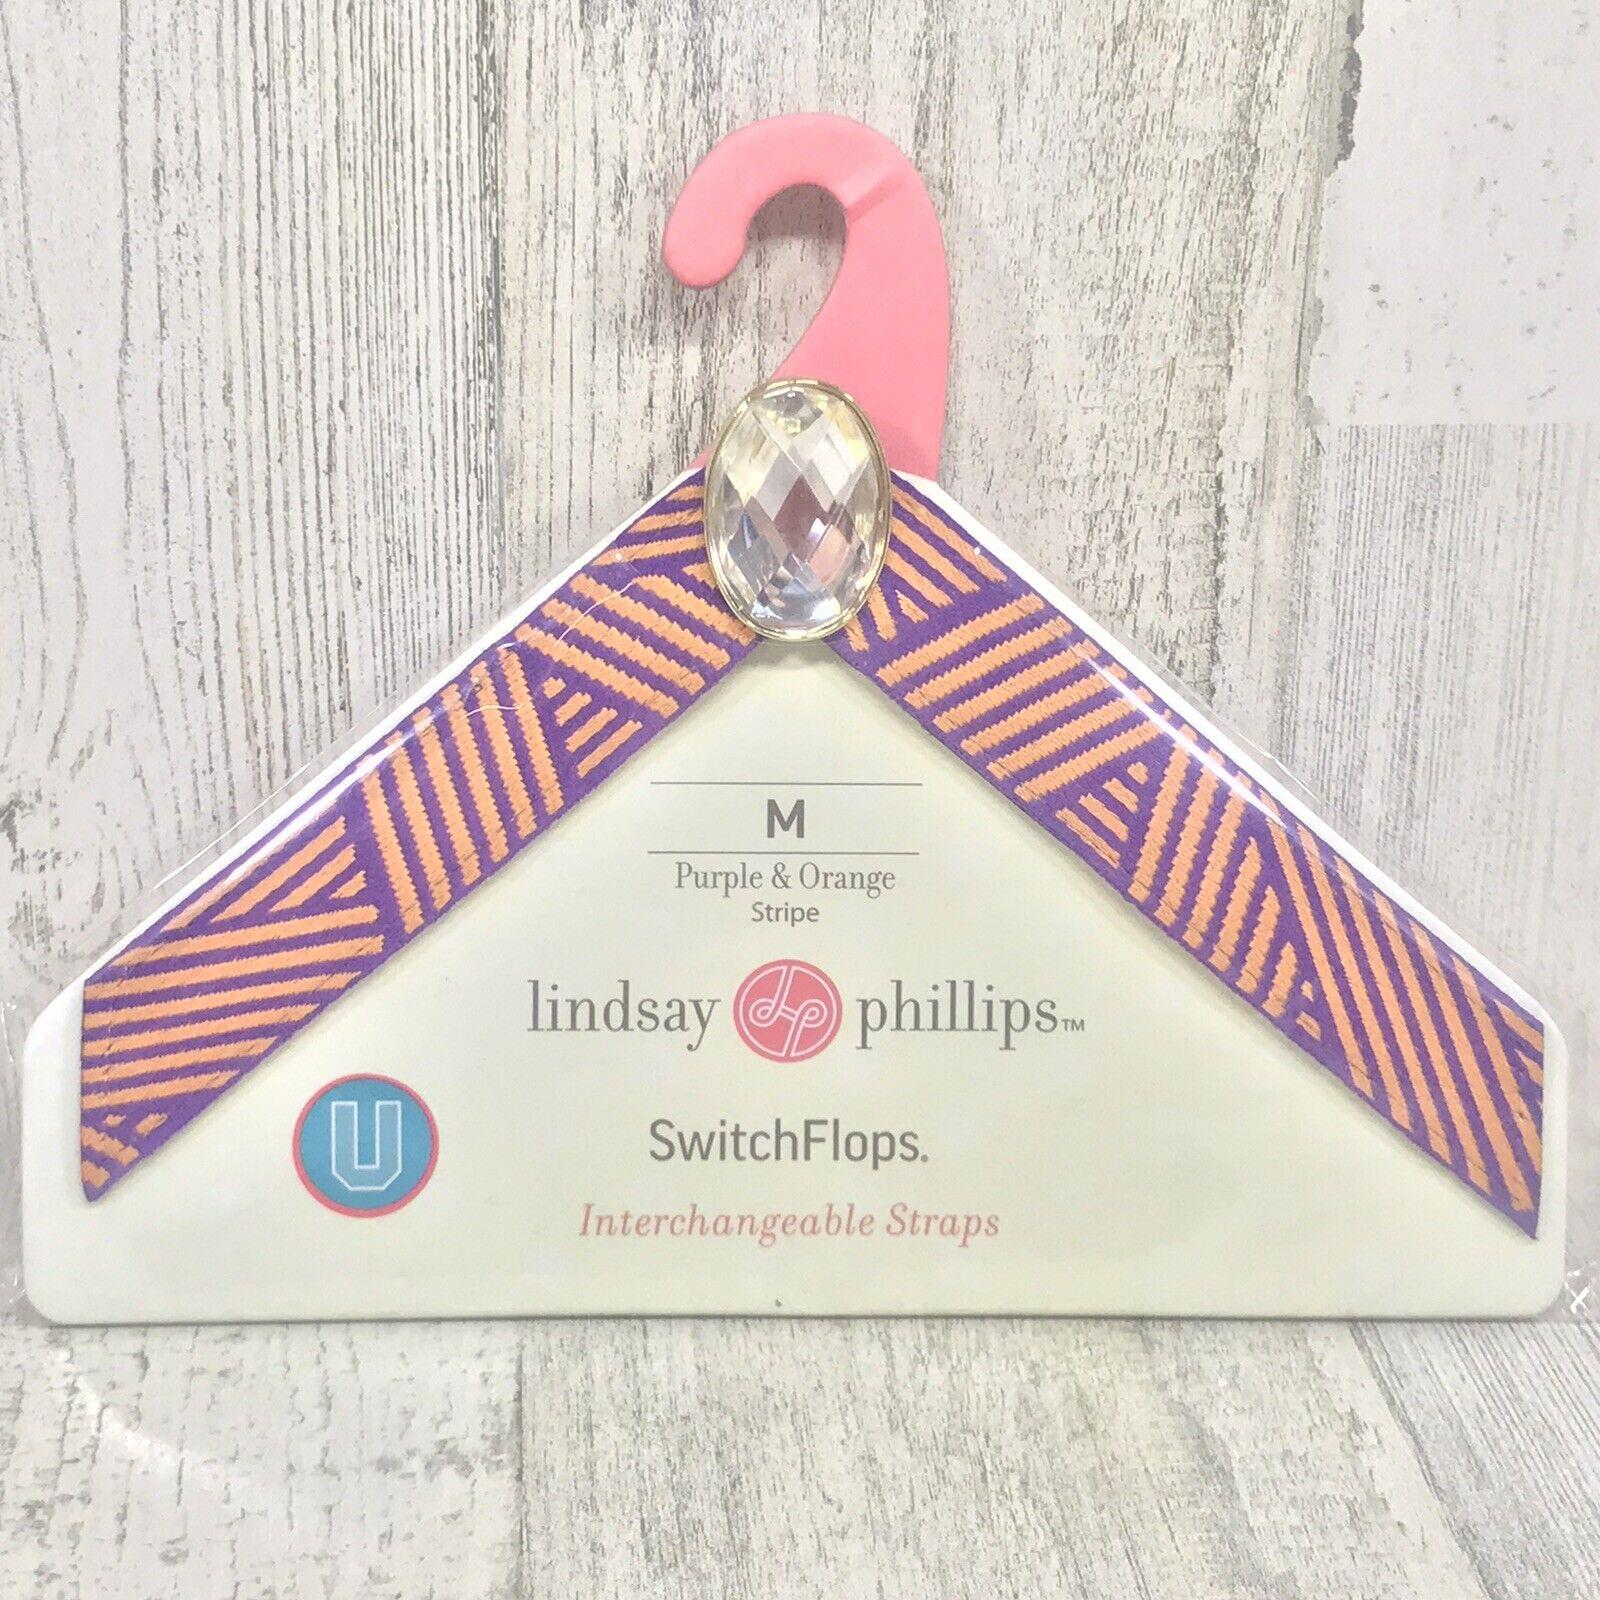 Lindsay Phillips SwitchFlops Interchangeable Straps Purple & Orange Strips - Med